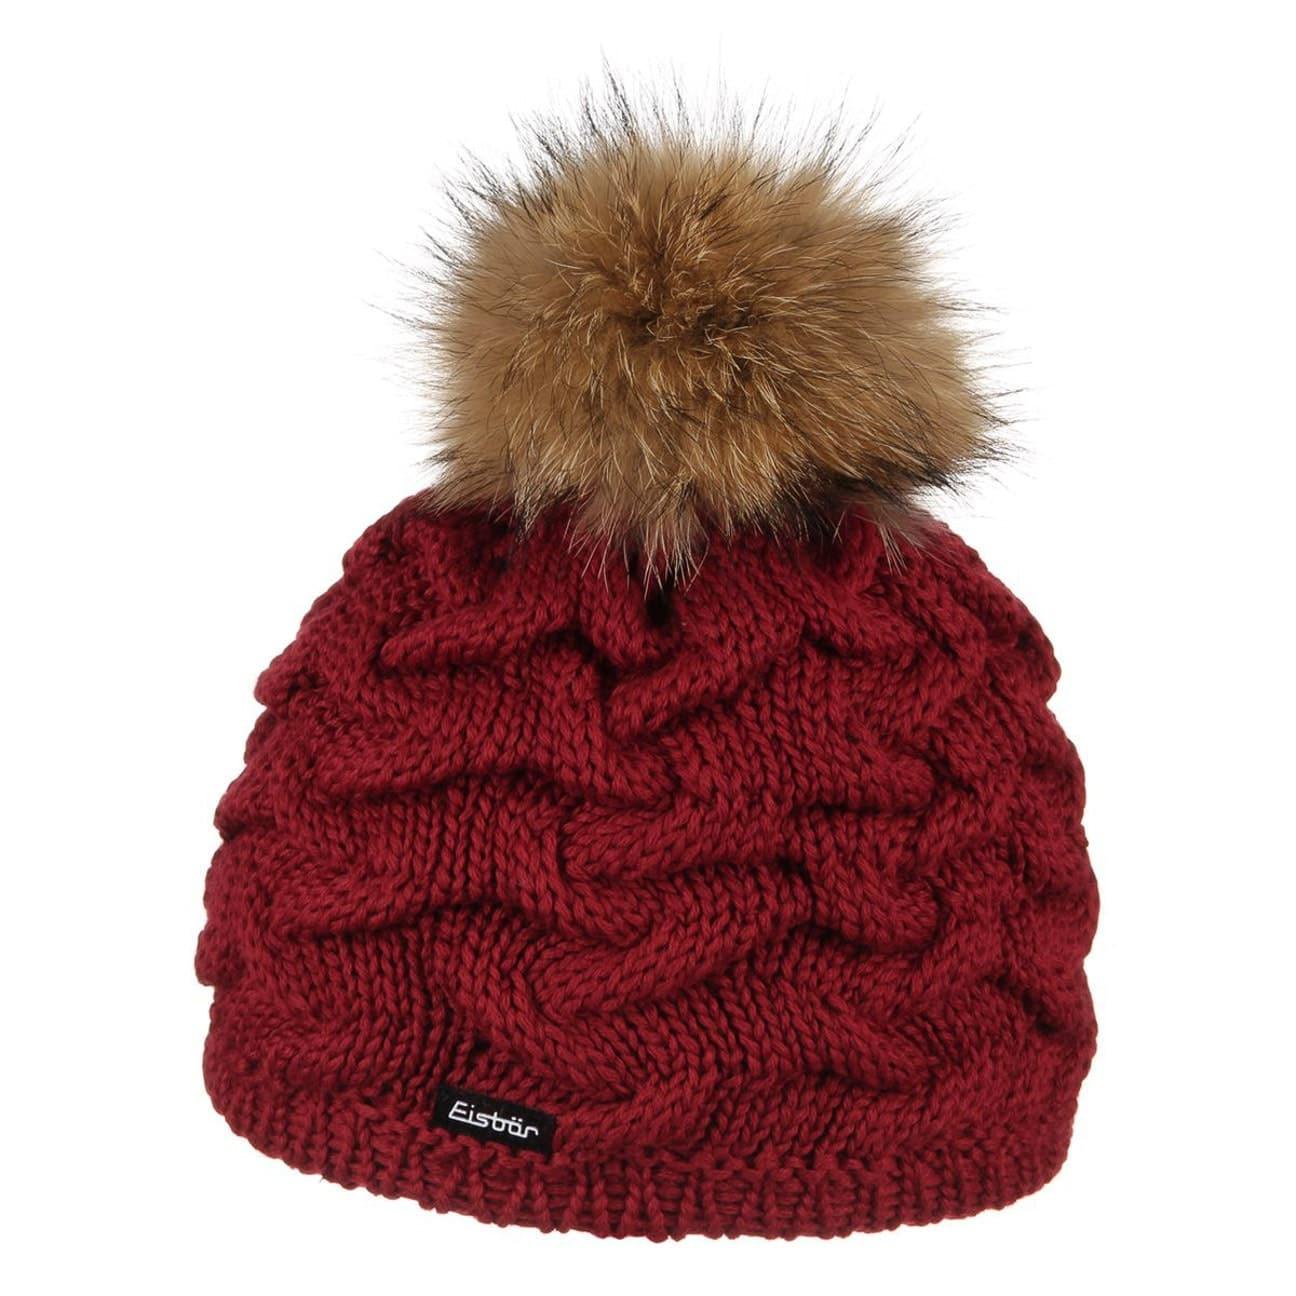 c2cd7f81c13 ... Pelita Faux Fur Women´s Hat by Eisbär - cream white 1 ...